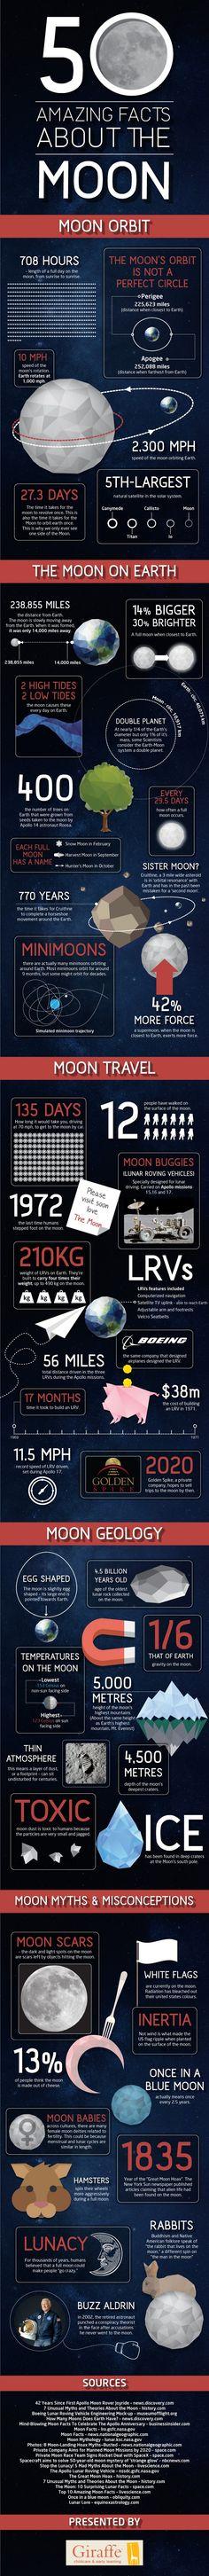 amazing moon facts